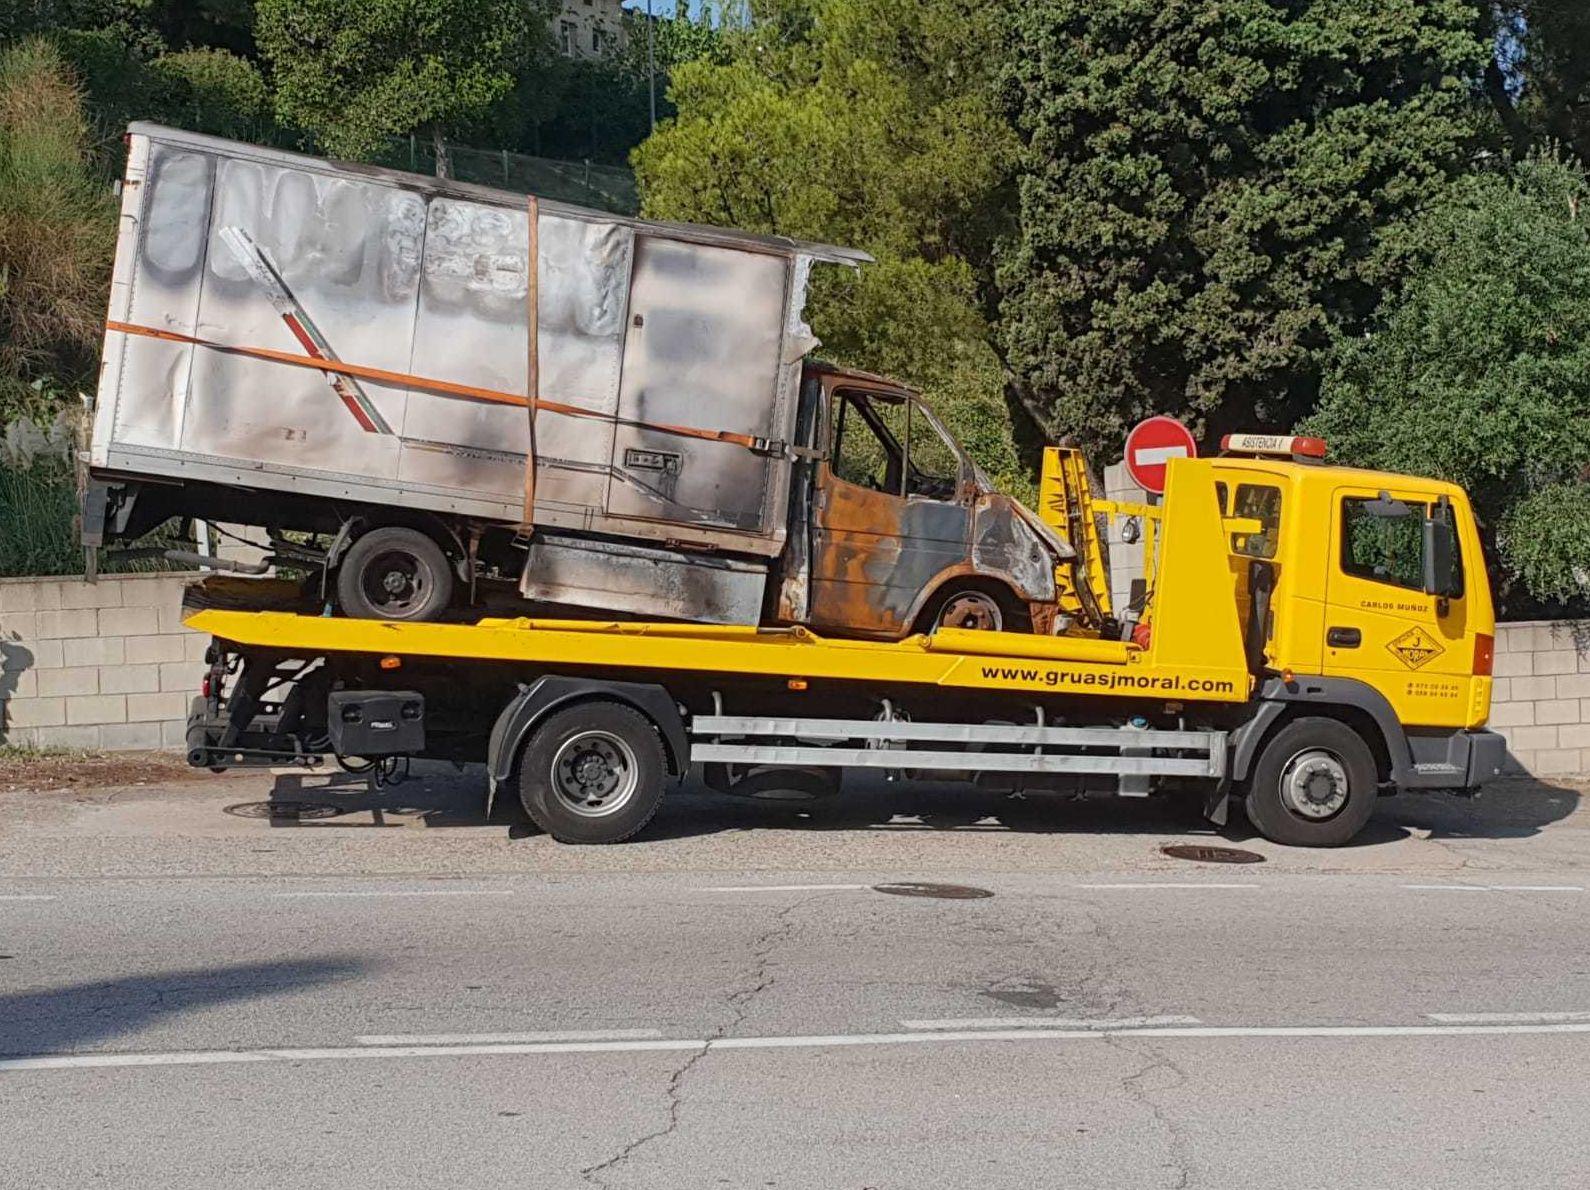 Grúas camiones Hospitalet